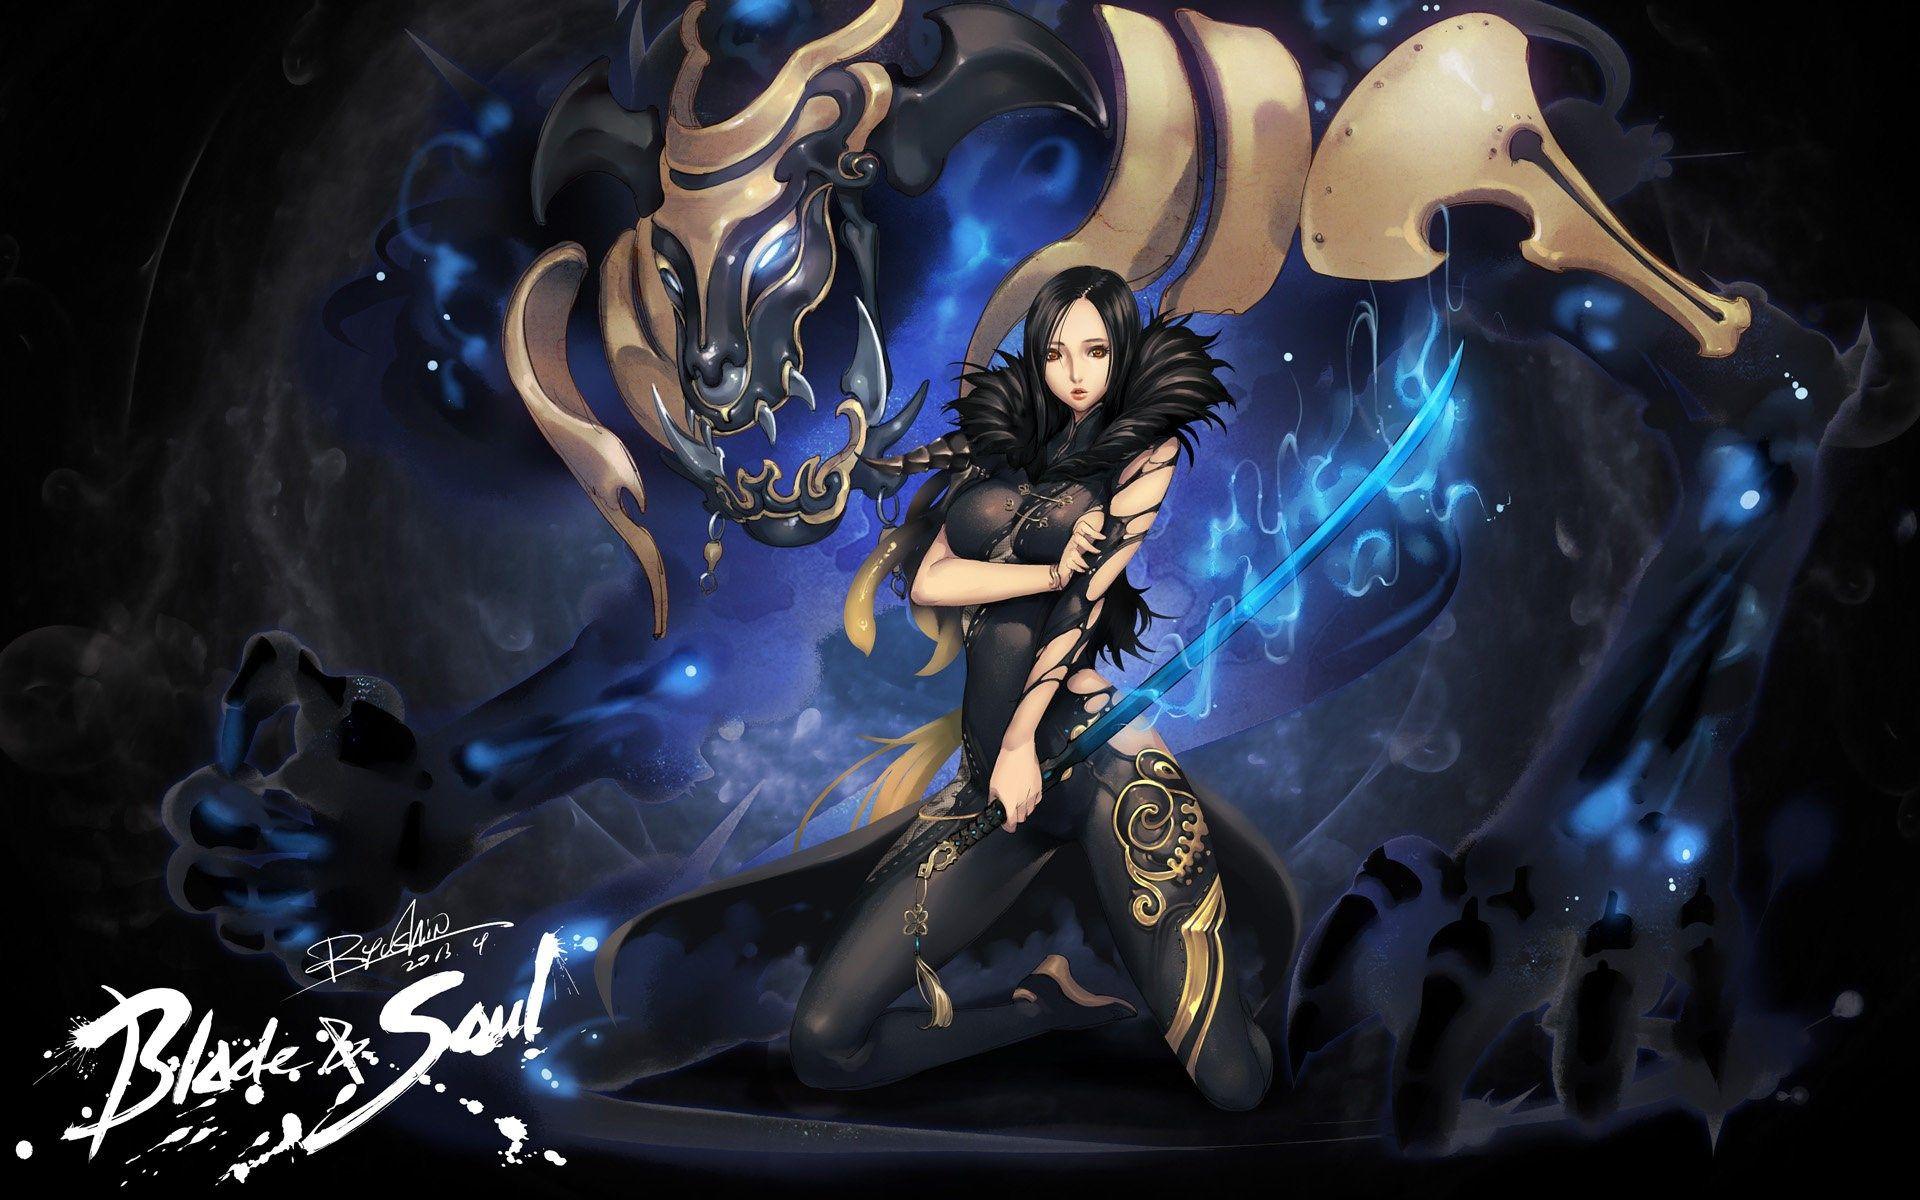 2017 03 28 Blade And Soul Wallpaper Desktop Nexus Wallpaper 1945430 Blade And Soul Fan Art Blade And Soul Anime